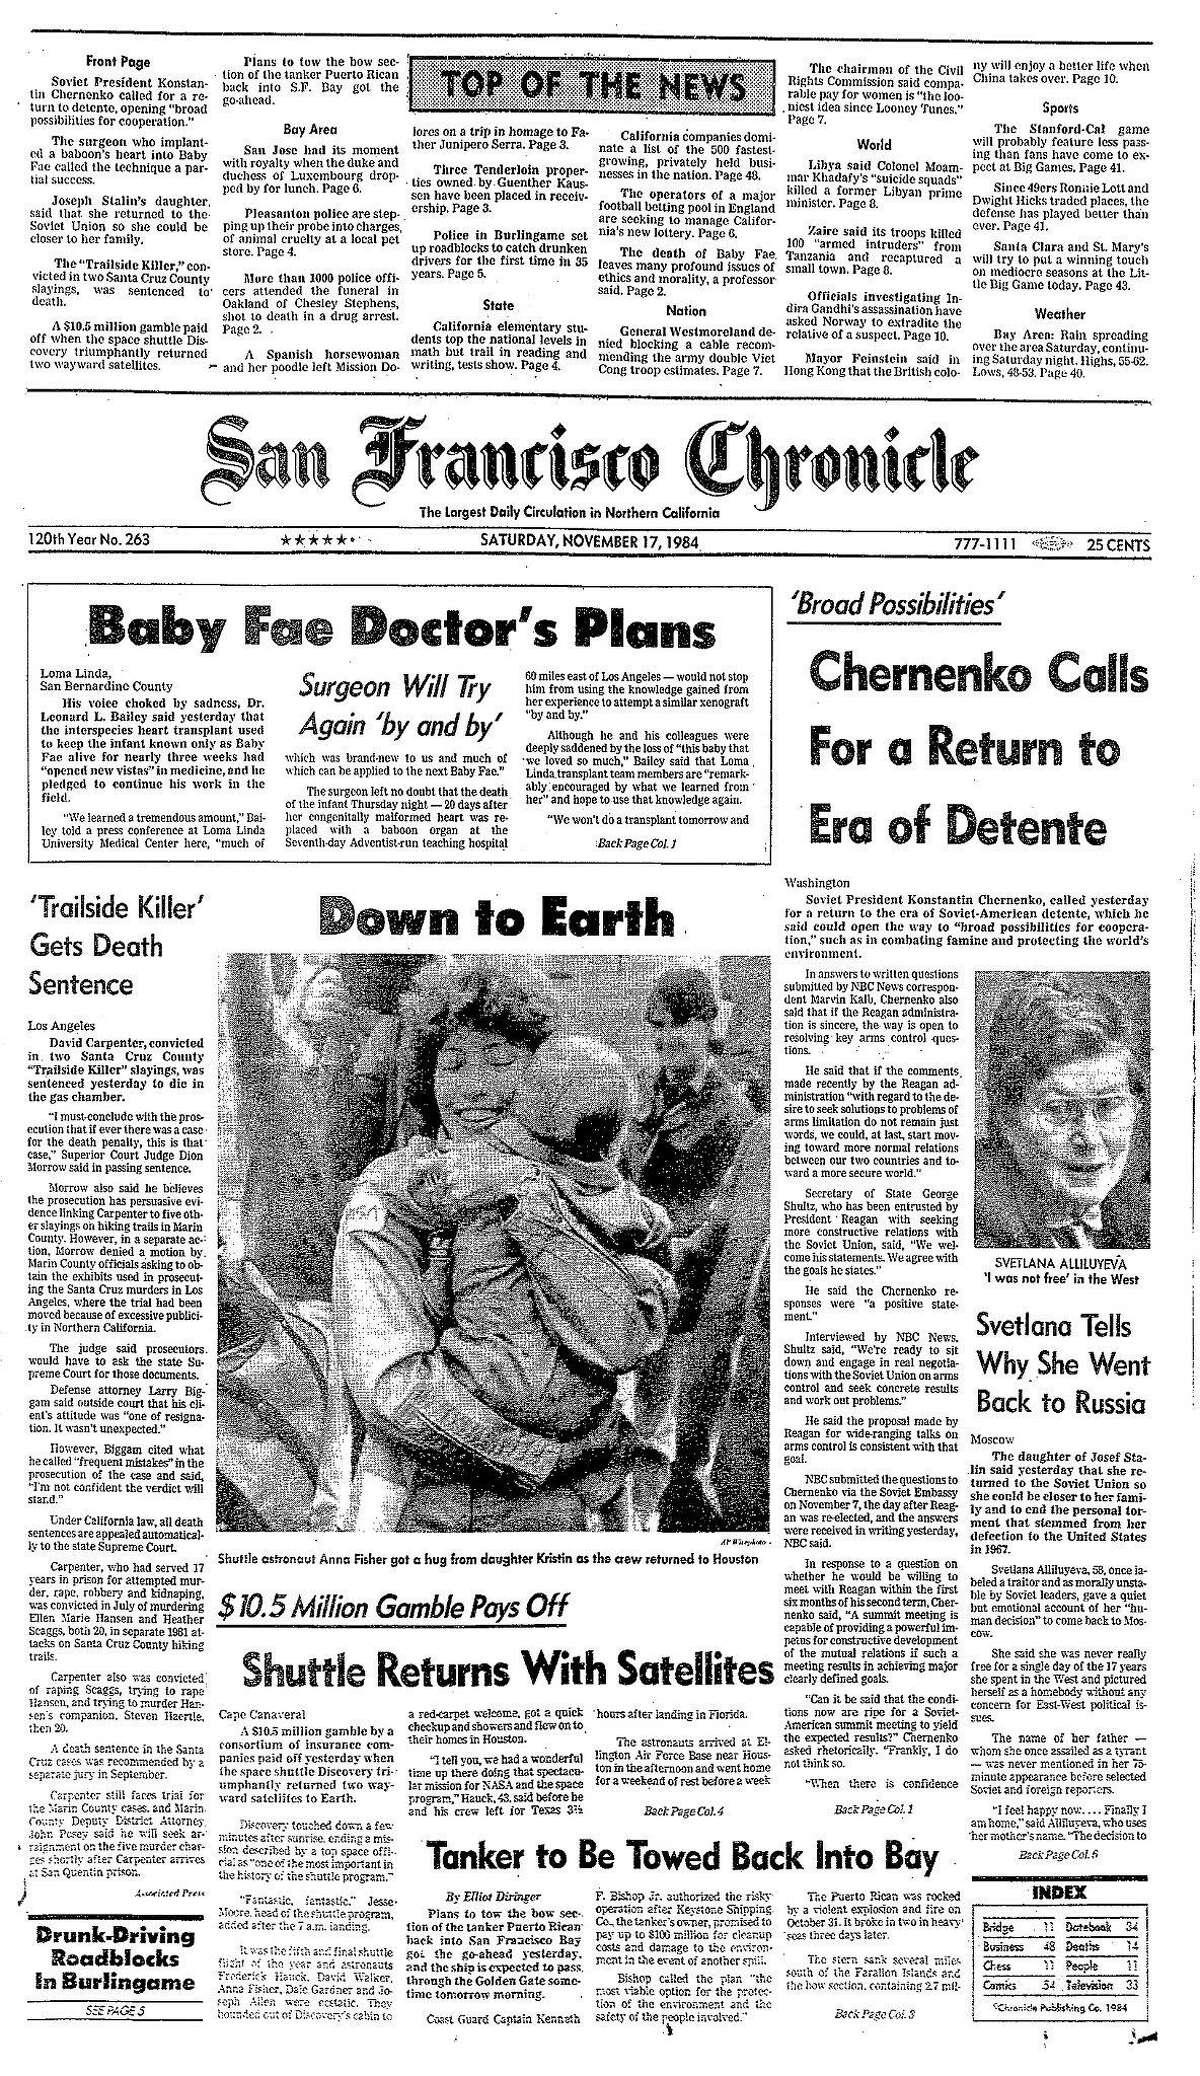 Historic Chronicle Front Page November 17, 1983 David Joseph Carpenter, the Trailside Killer is sentenced to death Chron365, Chroncover